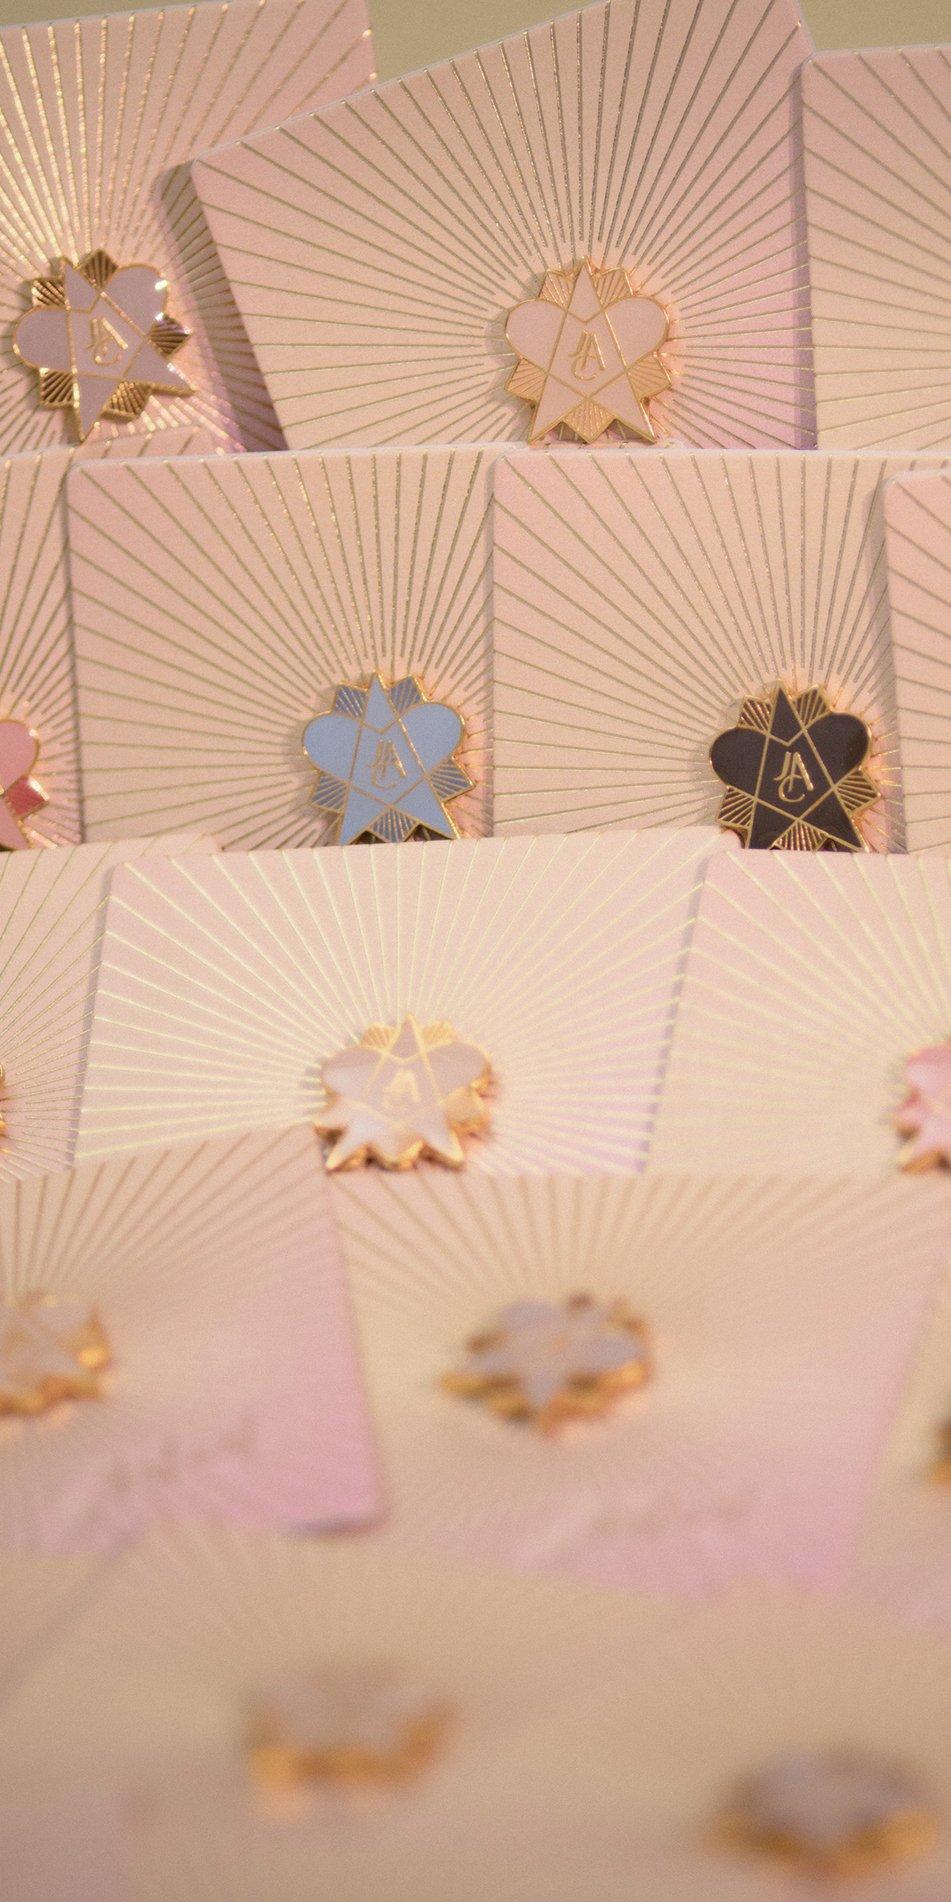 5 starheart pins 2